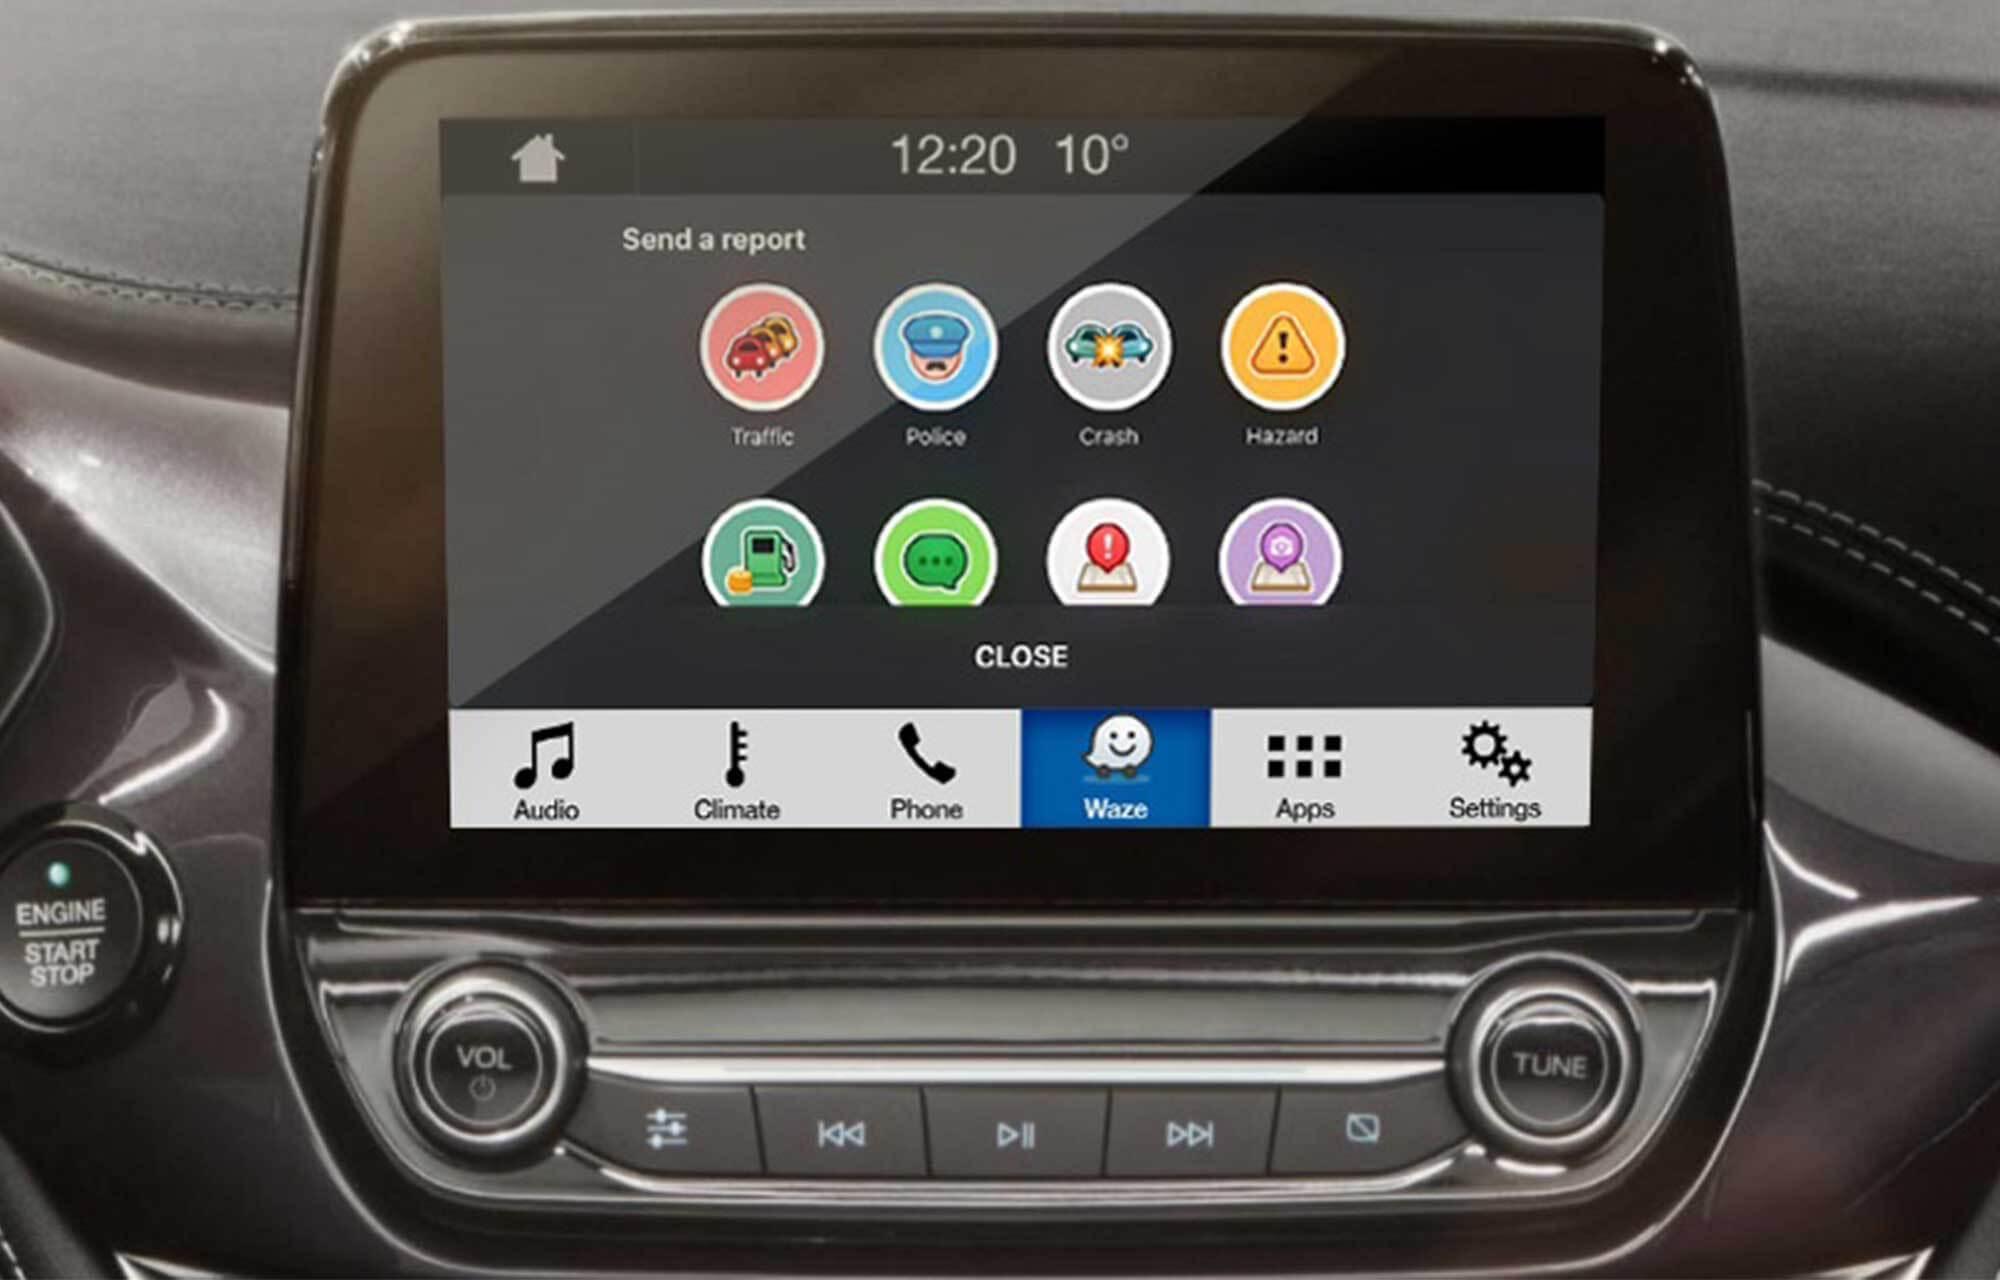 Waze Applink SYNC 3